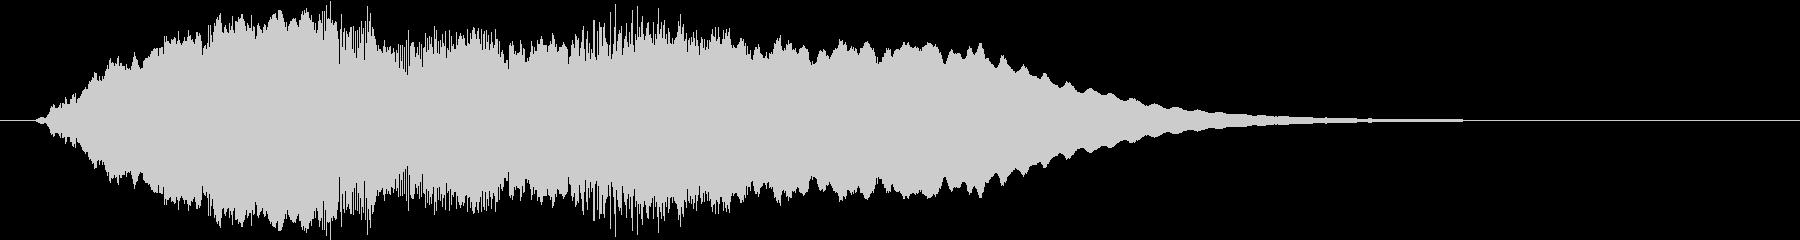 soft shaking jingleの未再生の波形